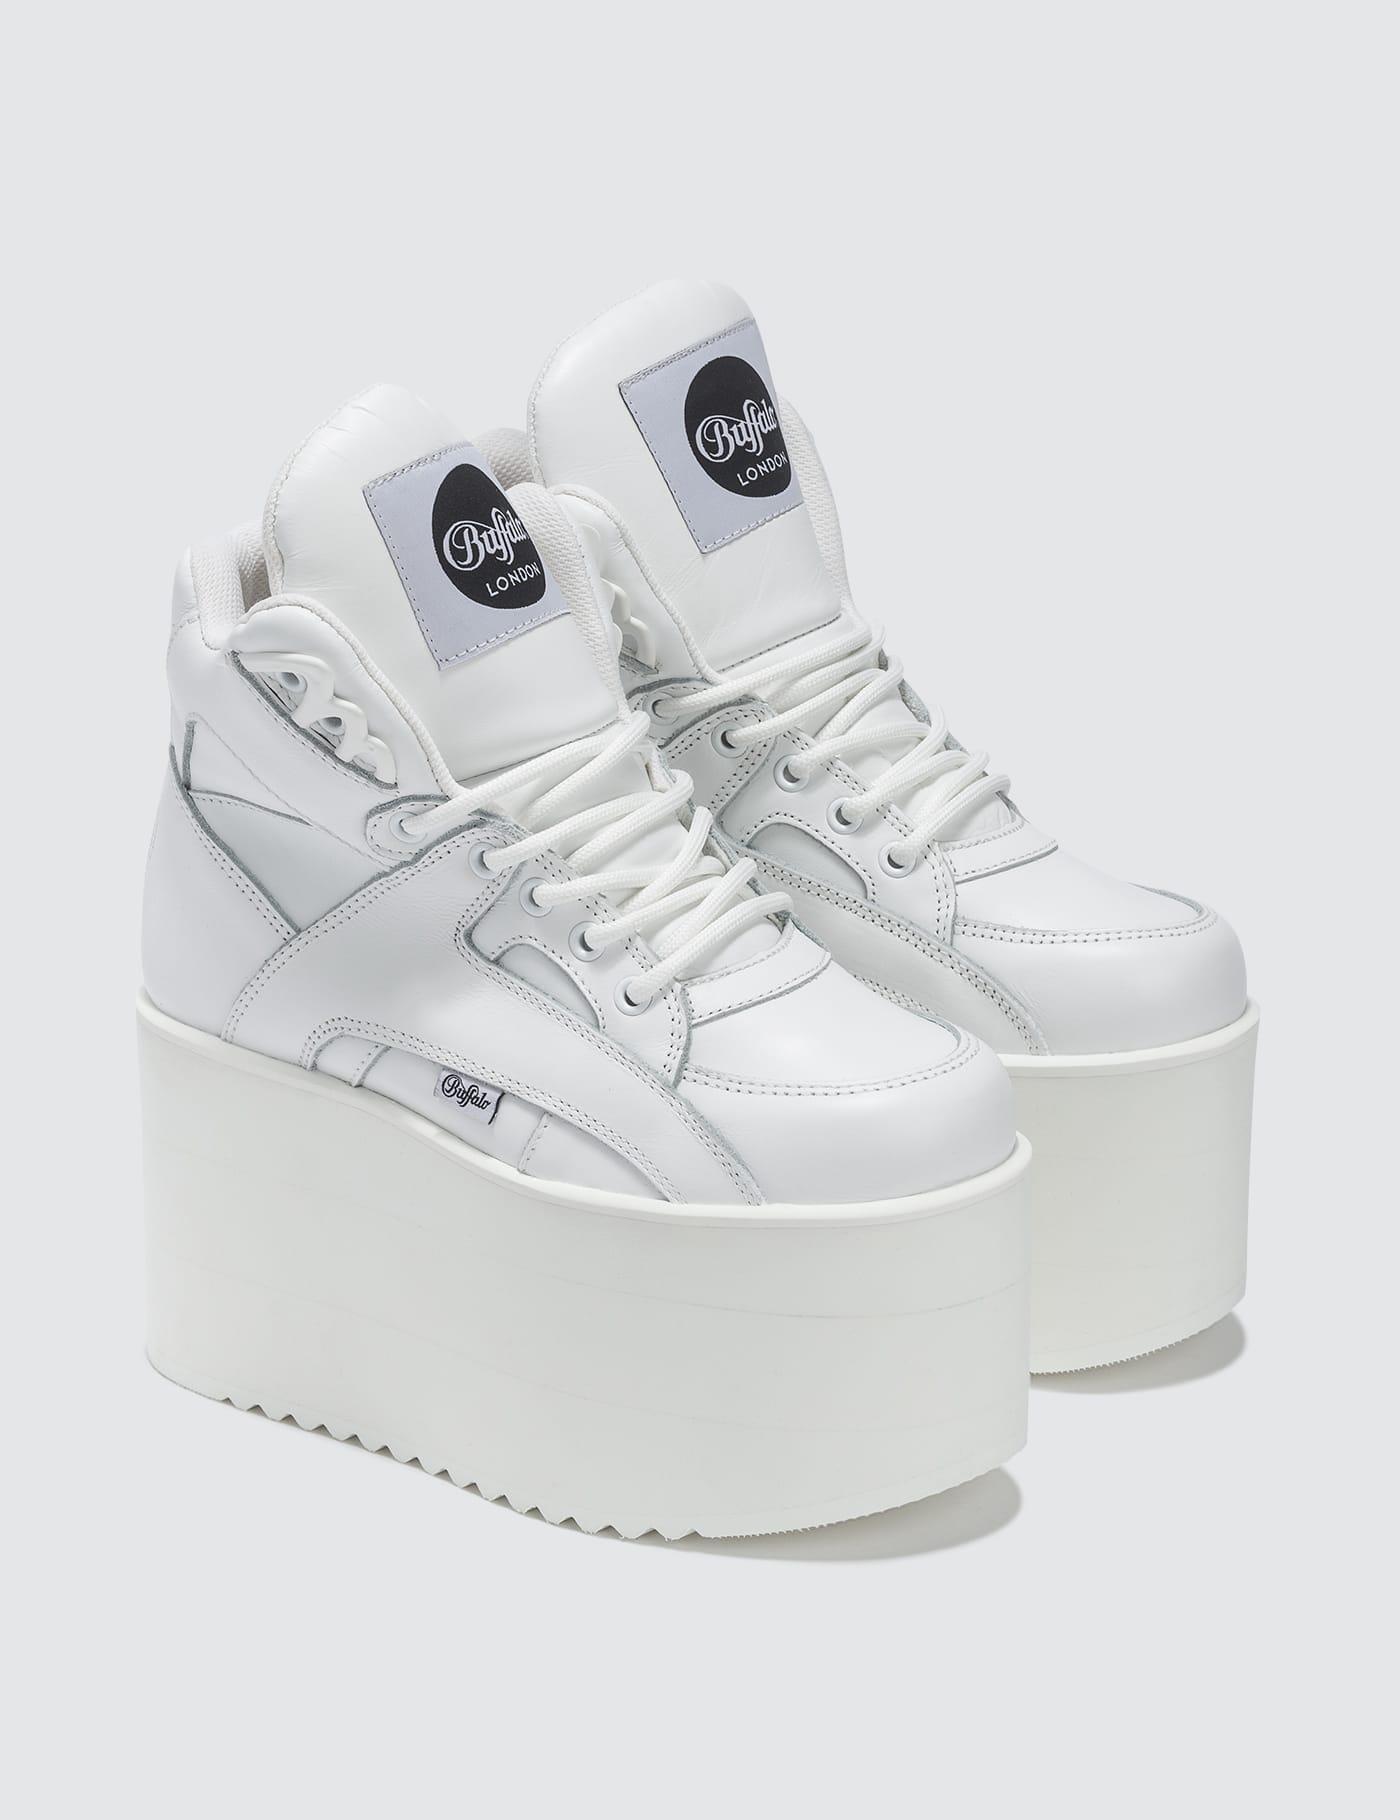 buffalo sneakers greece